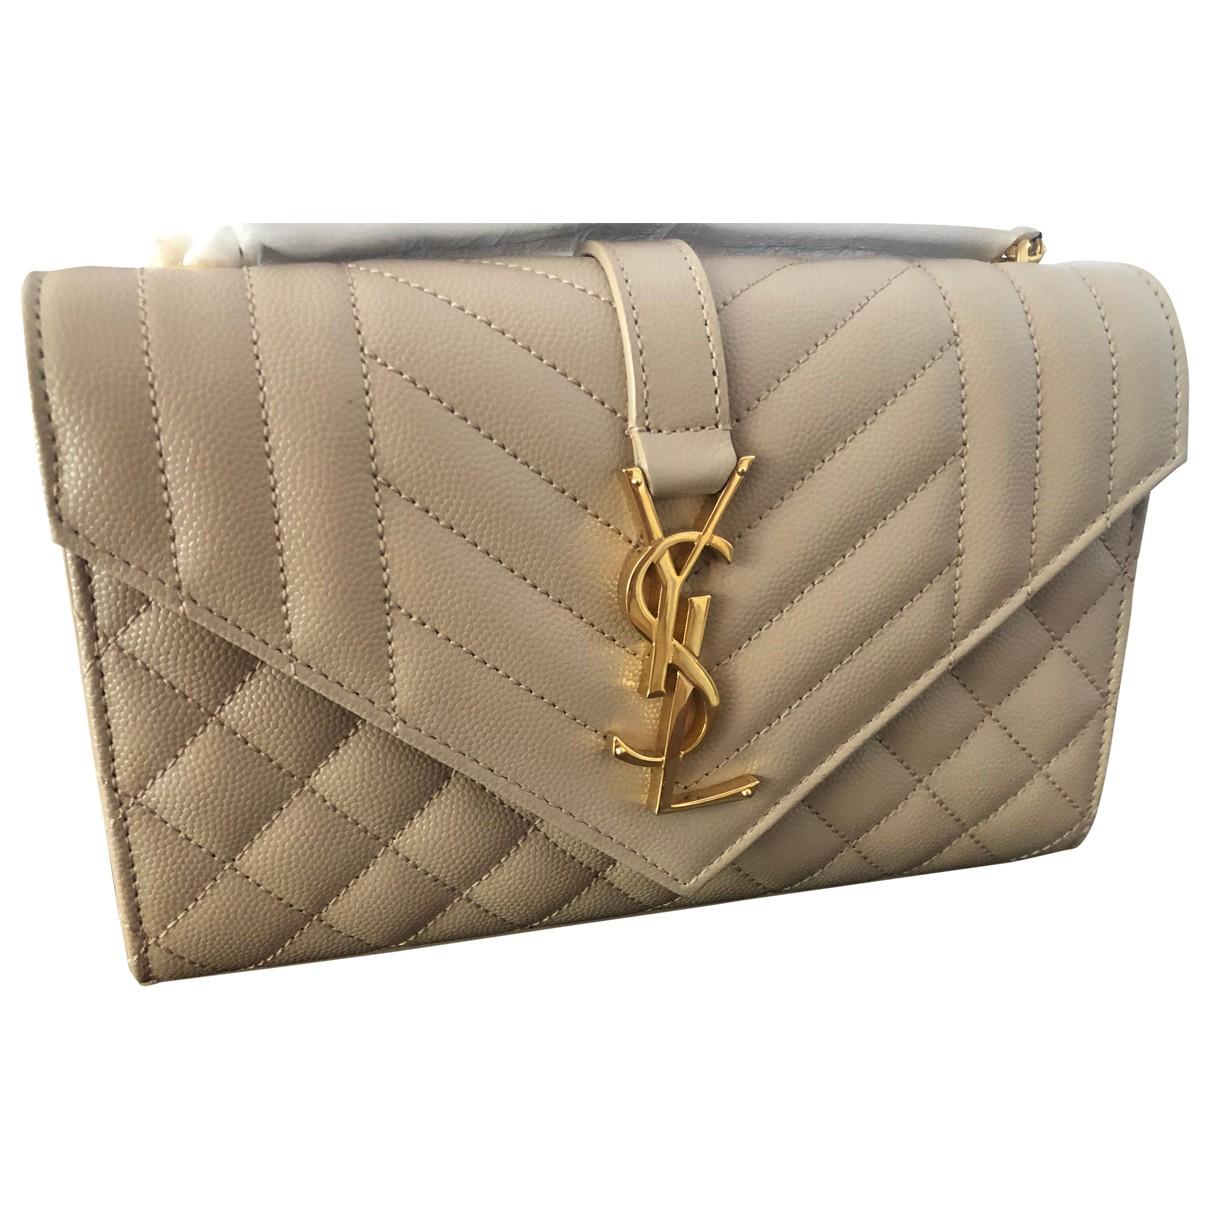 Saint Laurent Satchel monogramme Beige Leather Clutch bag for Women \N